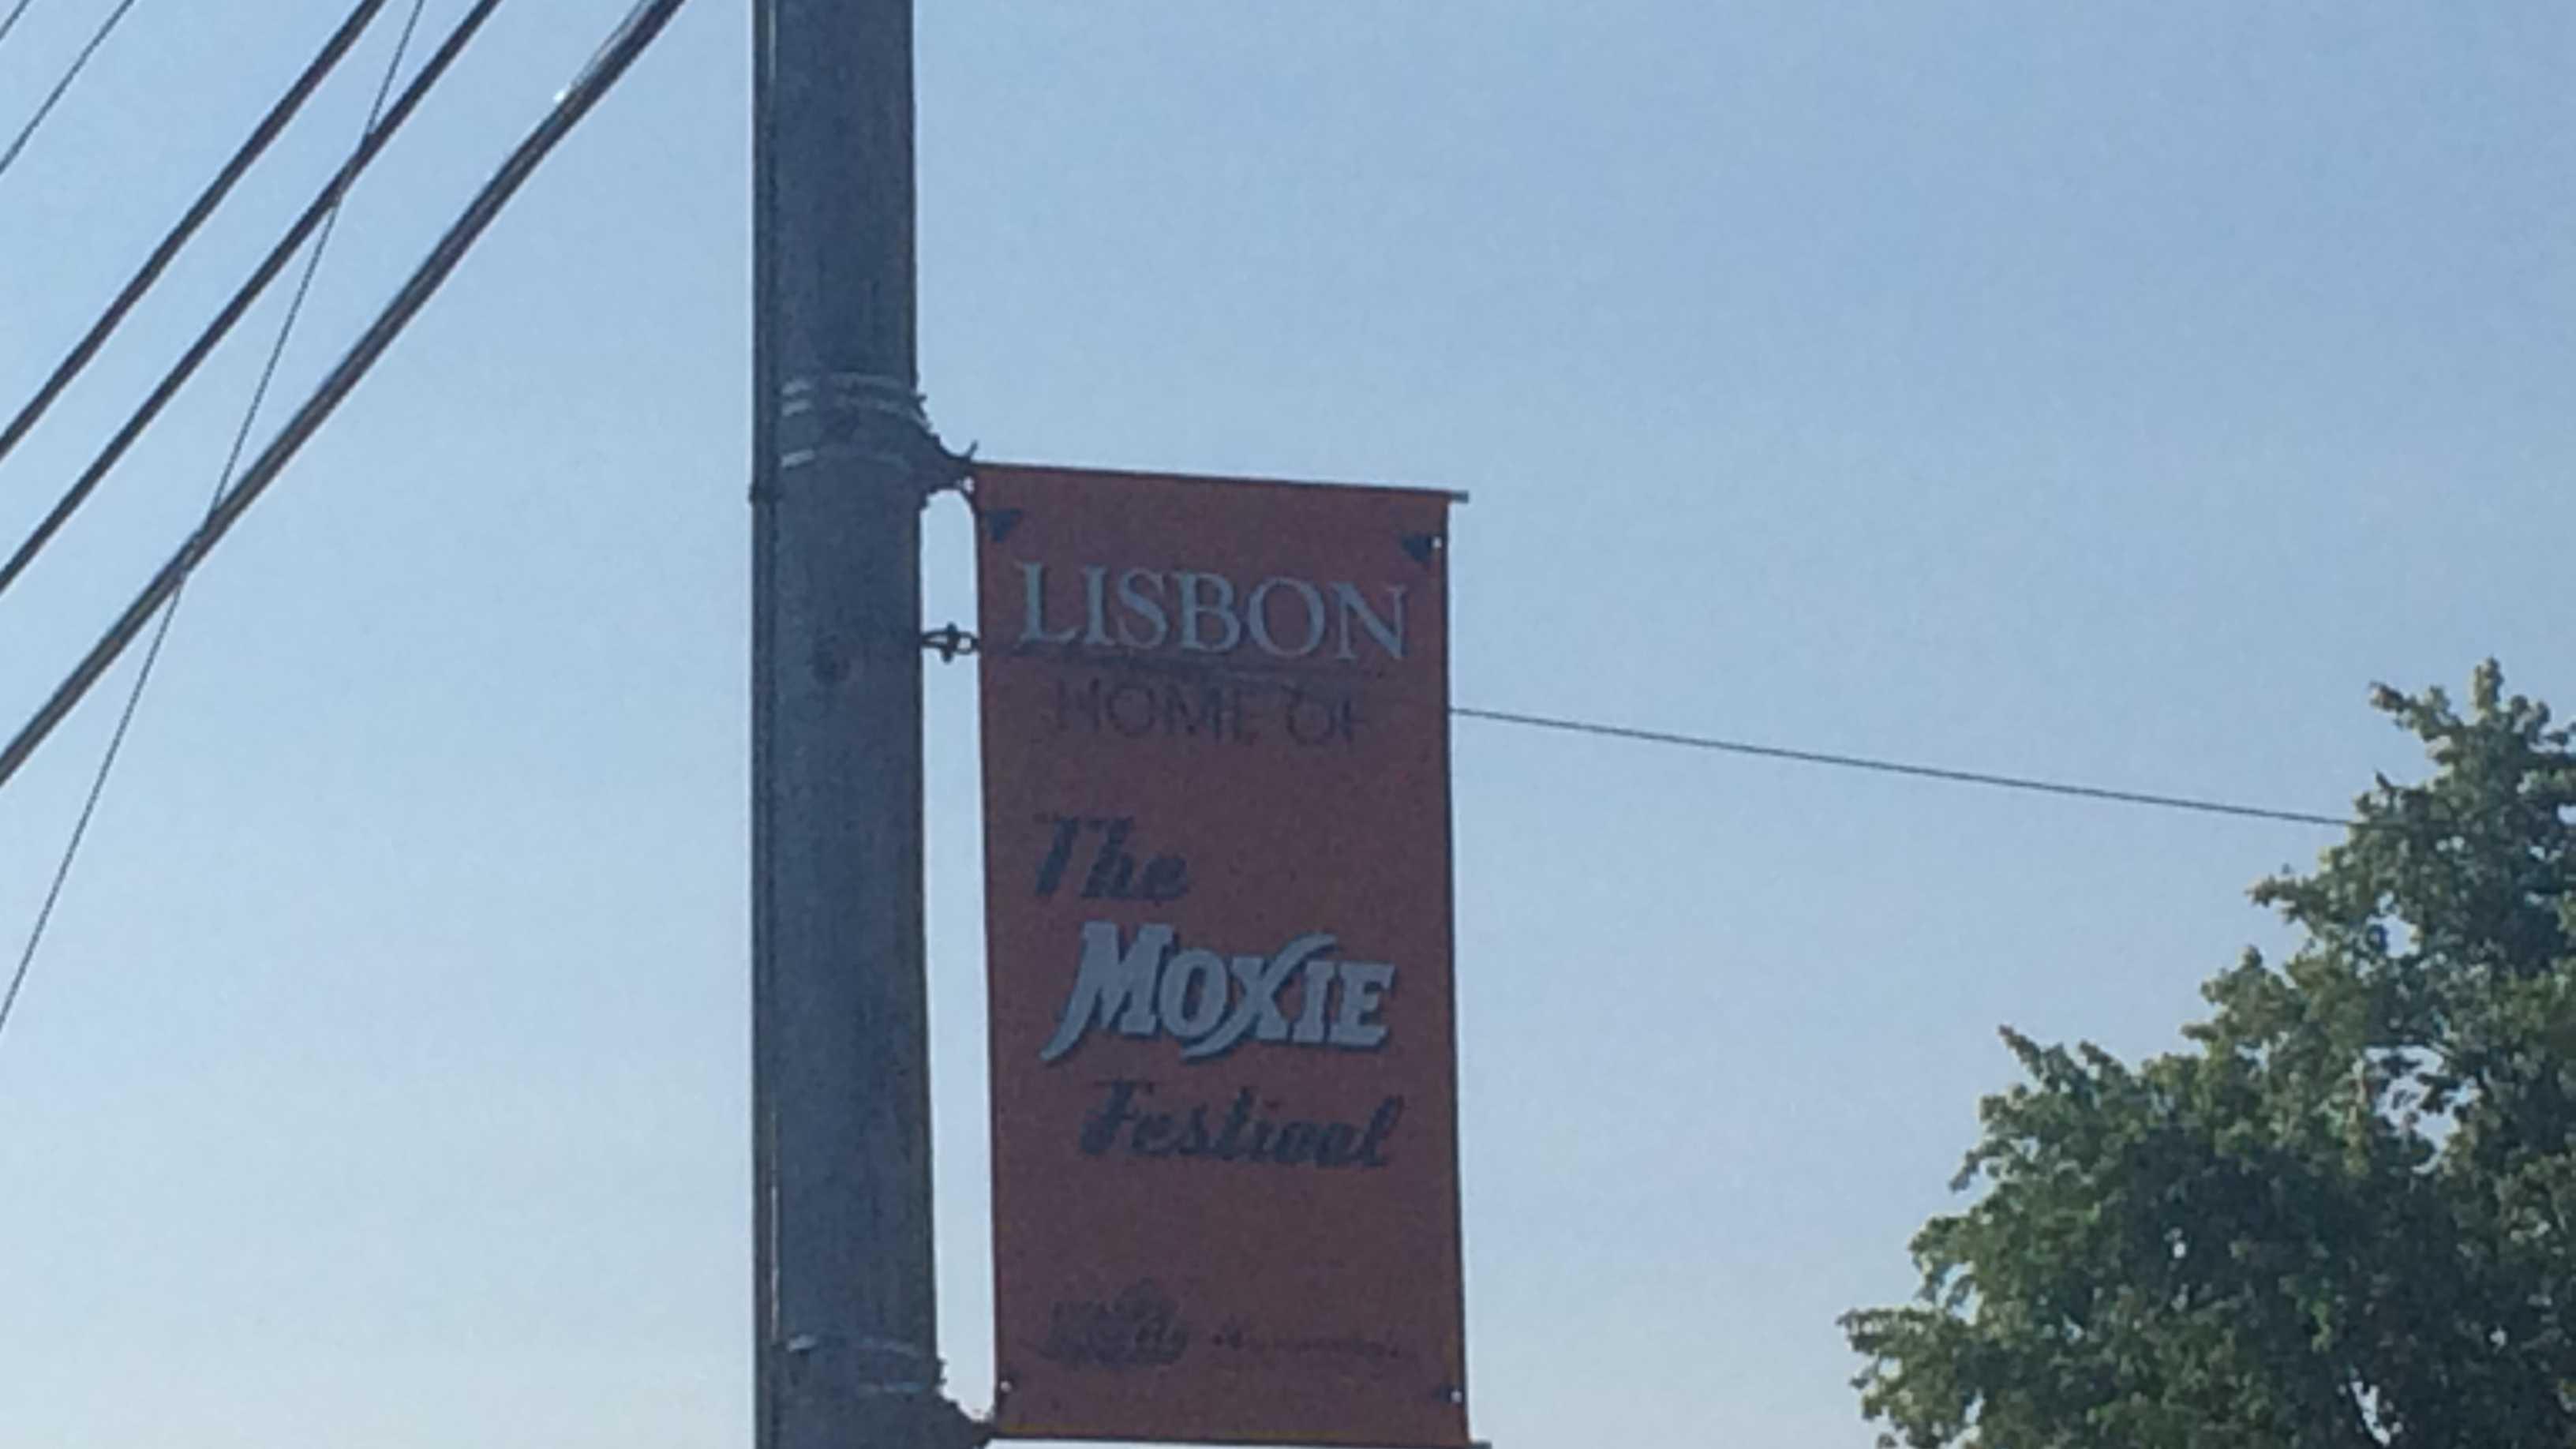 Lisbon's Moxie Festival celebrates 33 years